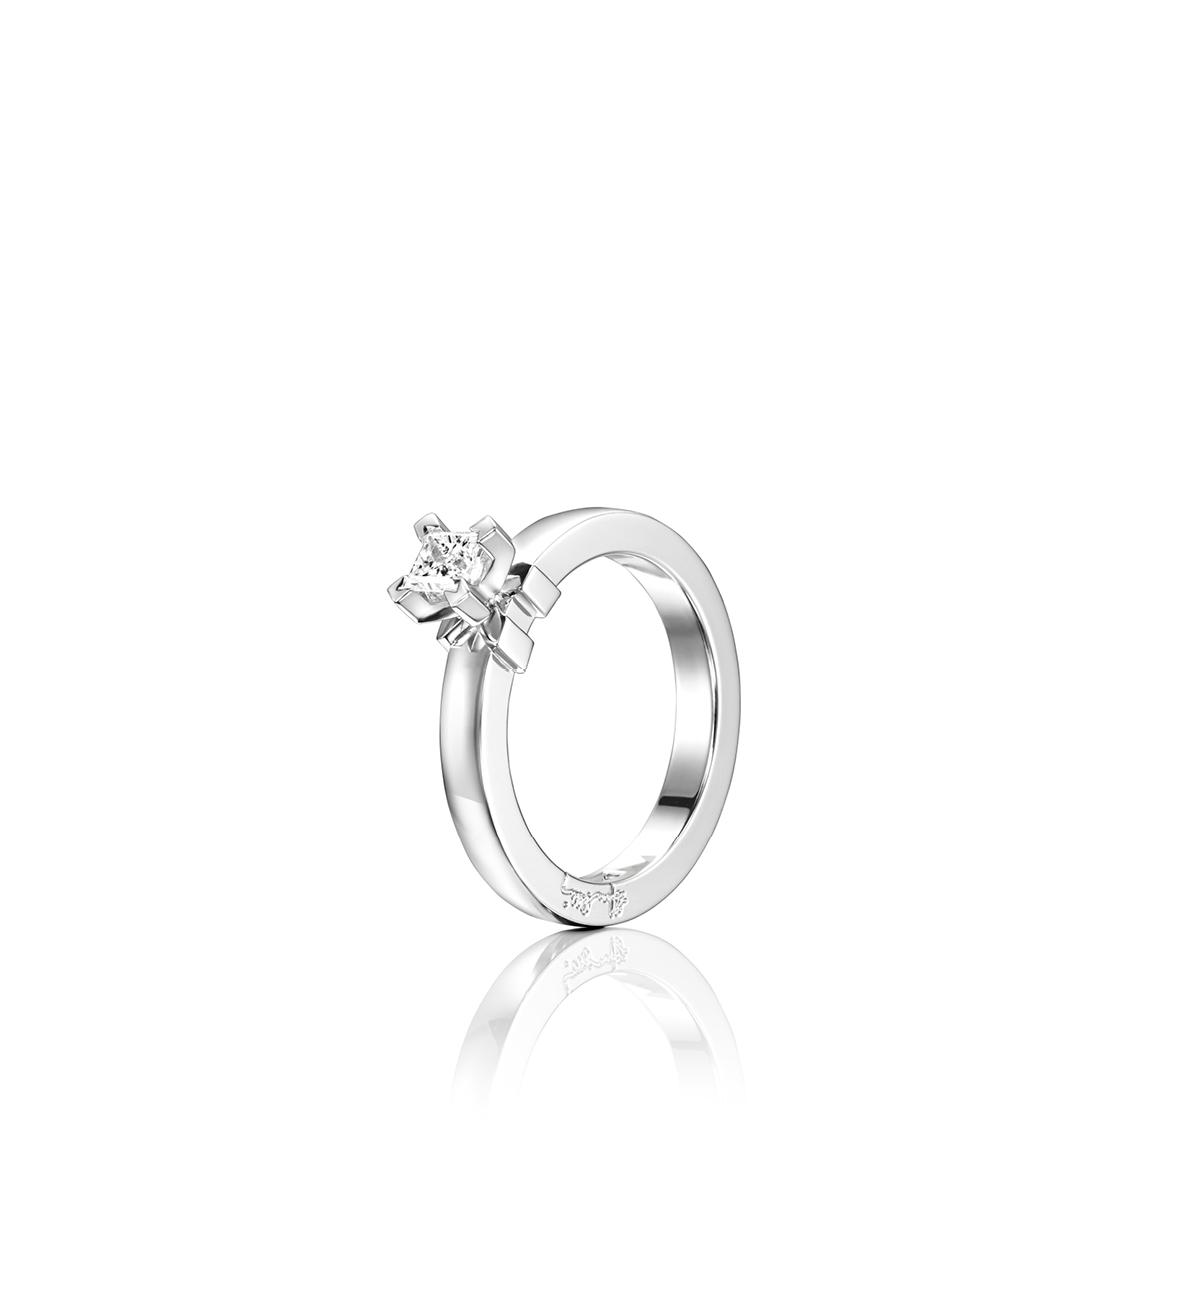 : - Dolce Vita Princess Ring Vitguld 0,30 ct